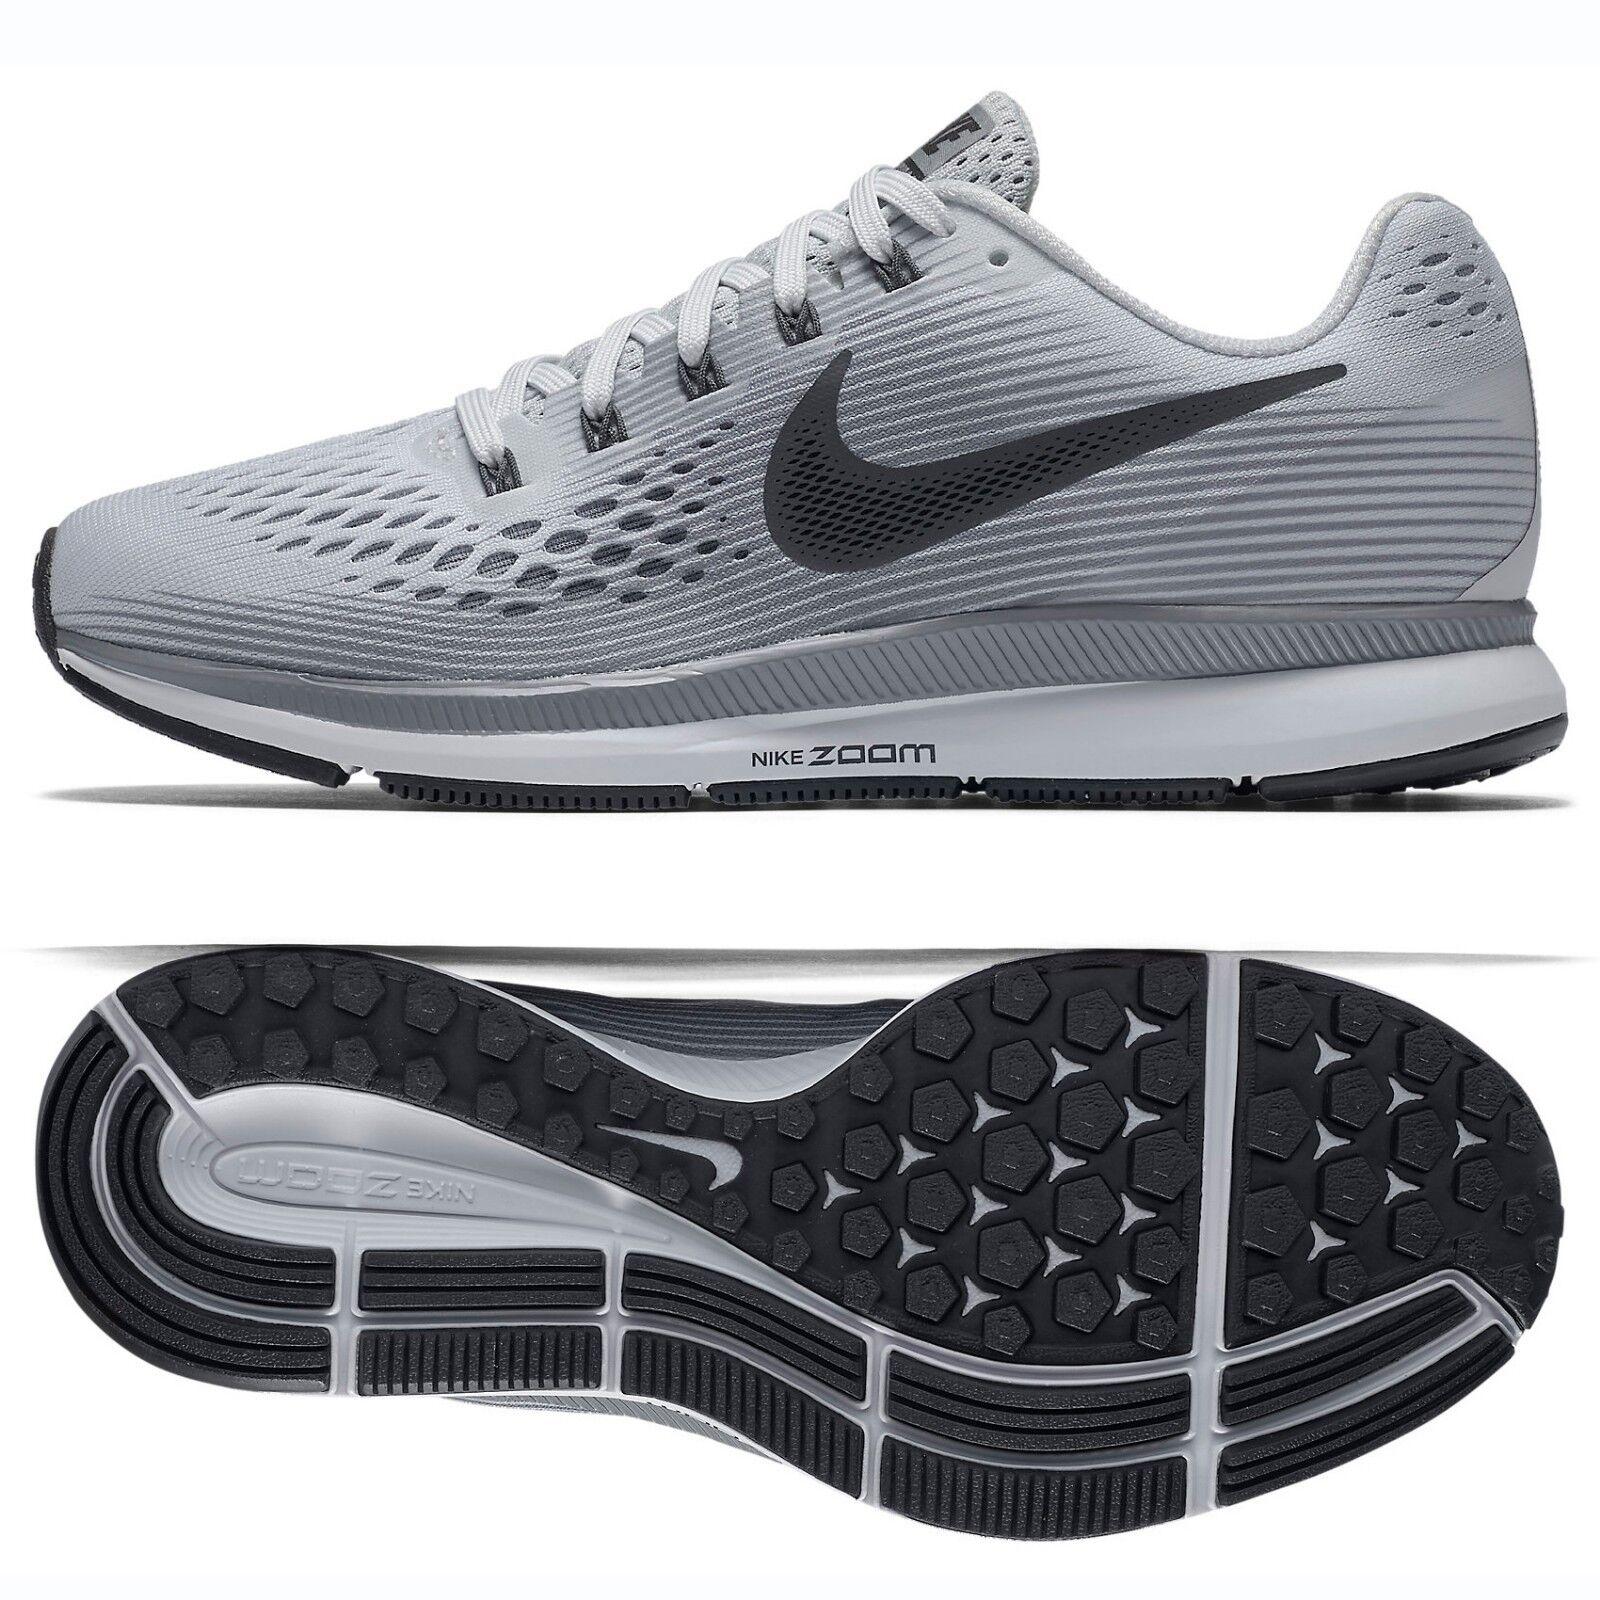 Nike WMNS Air Zoom Pegasus 34 880560-010 Platinum Anthracite Women Running shoes